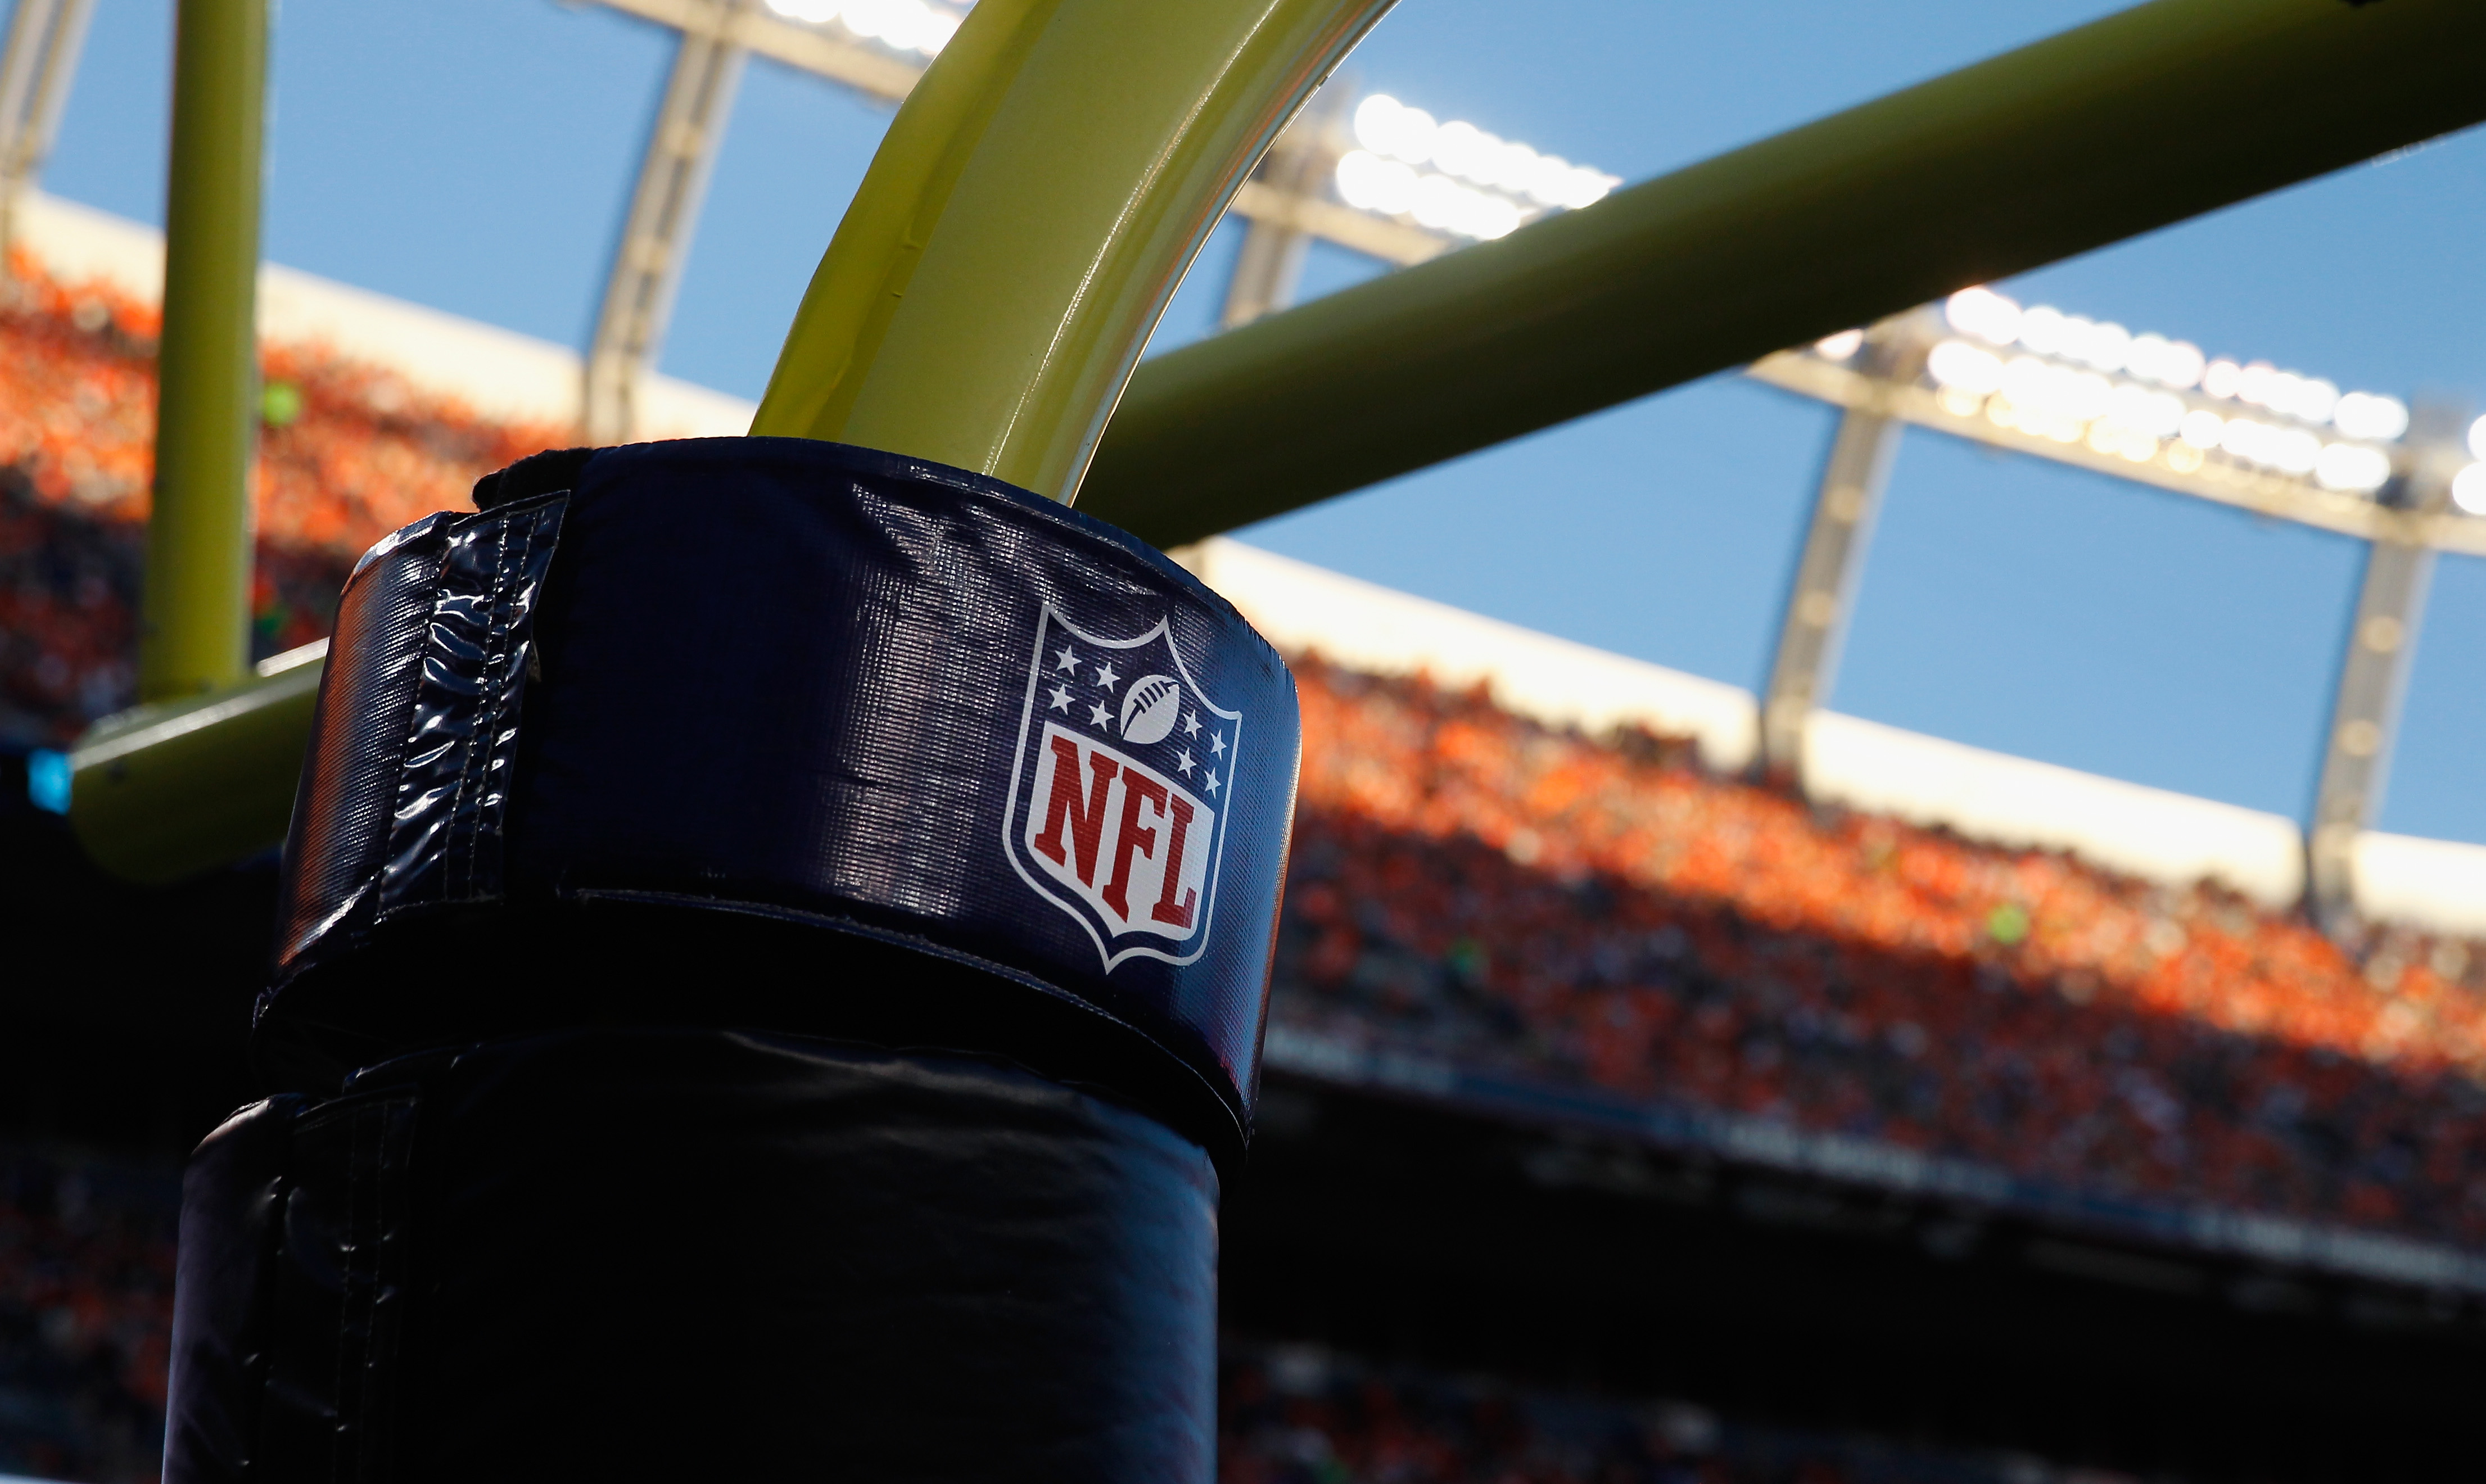 NFL_072619_getty_ftr